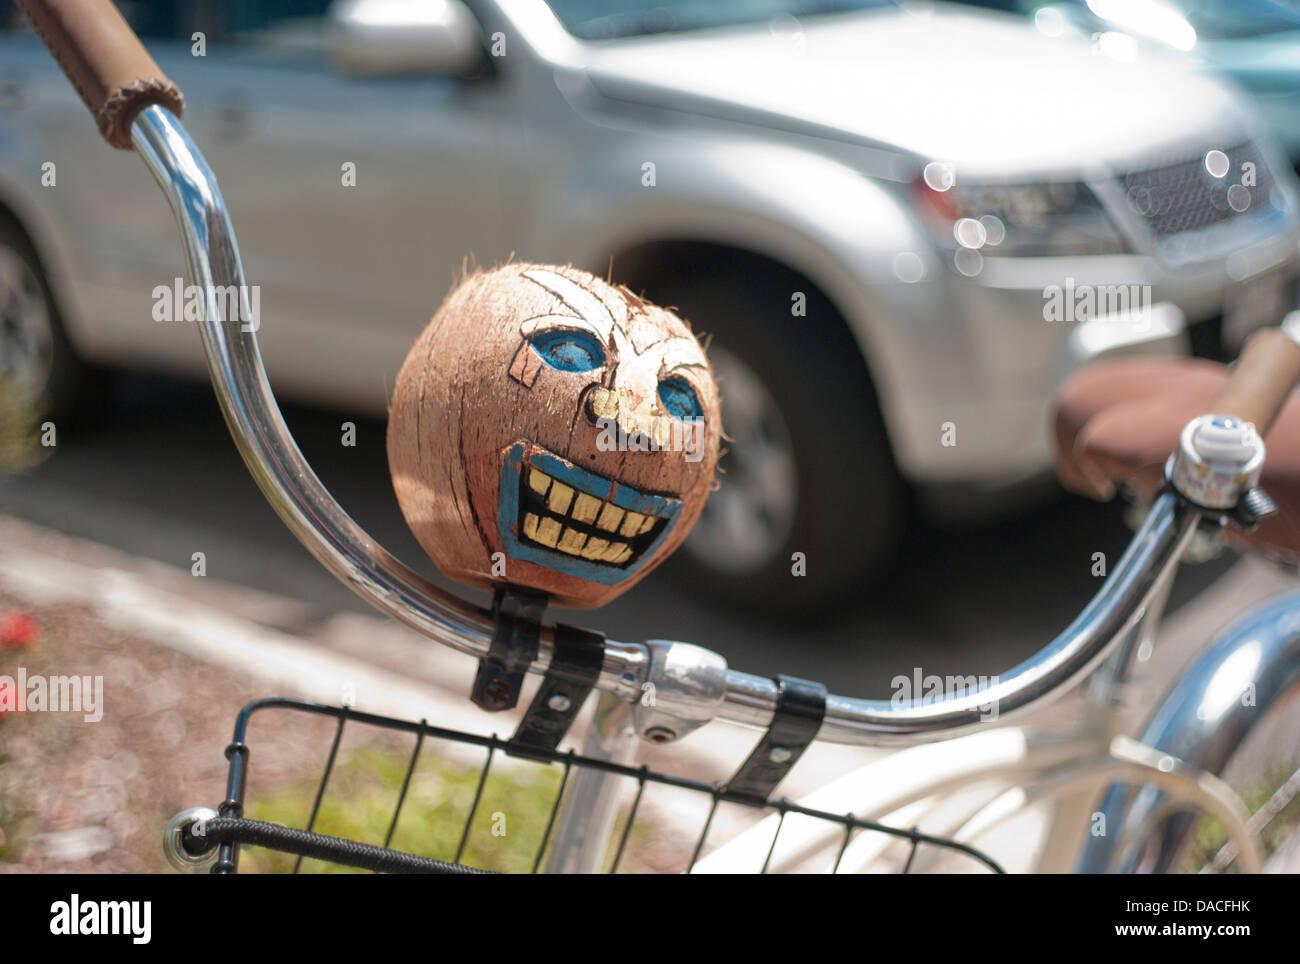 Coconut head on bicycle handlebars. - Stock Image